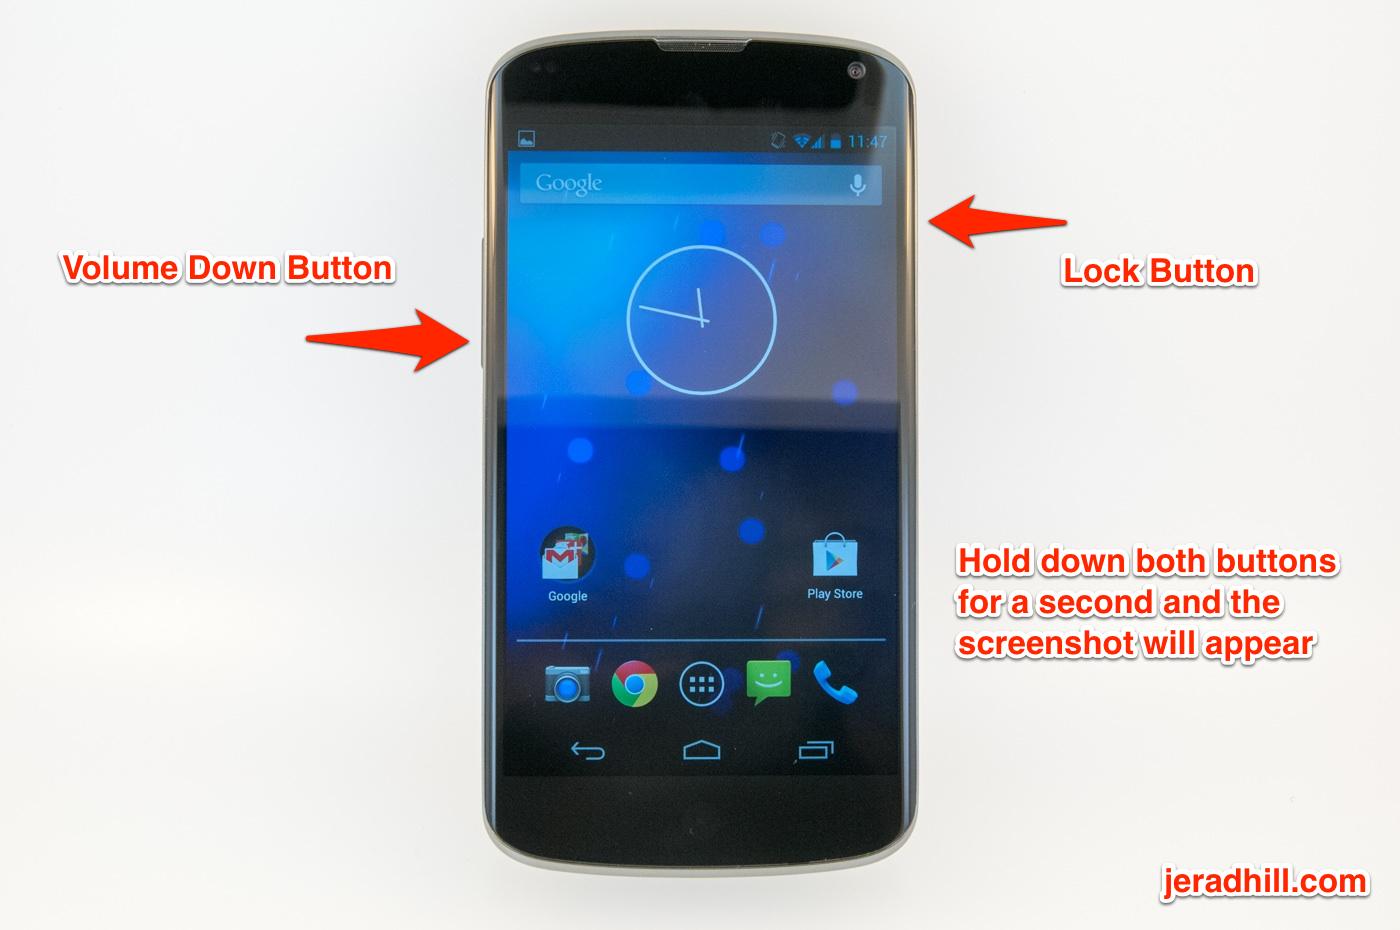 How to take a screenshot with a Google Nexus 4